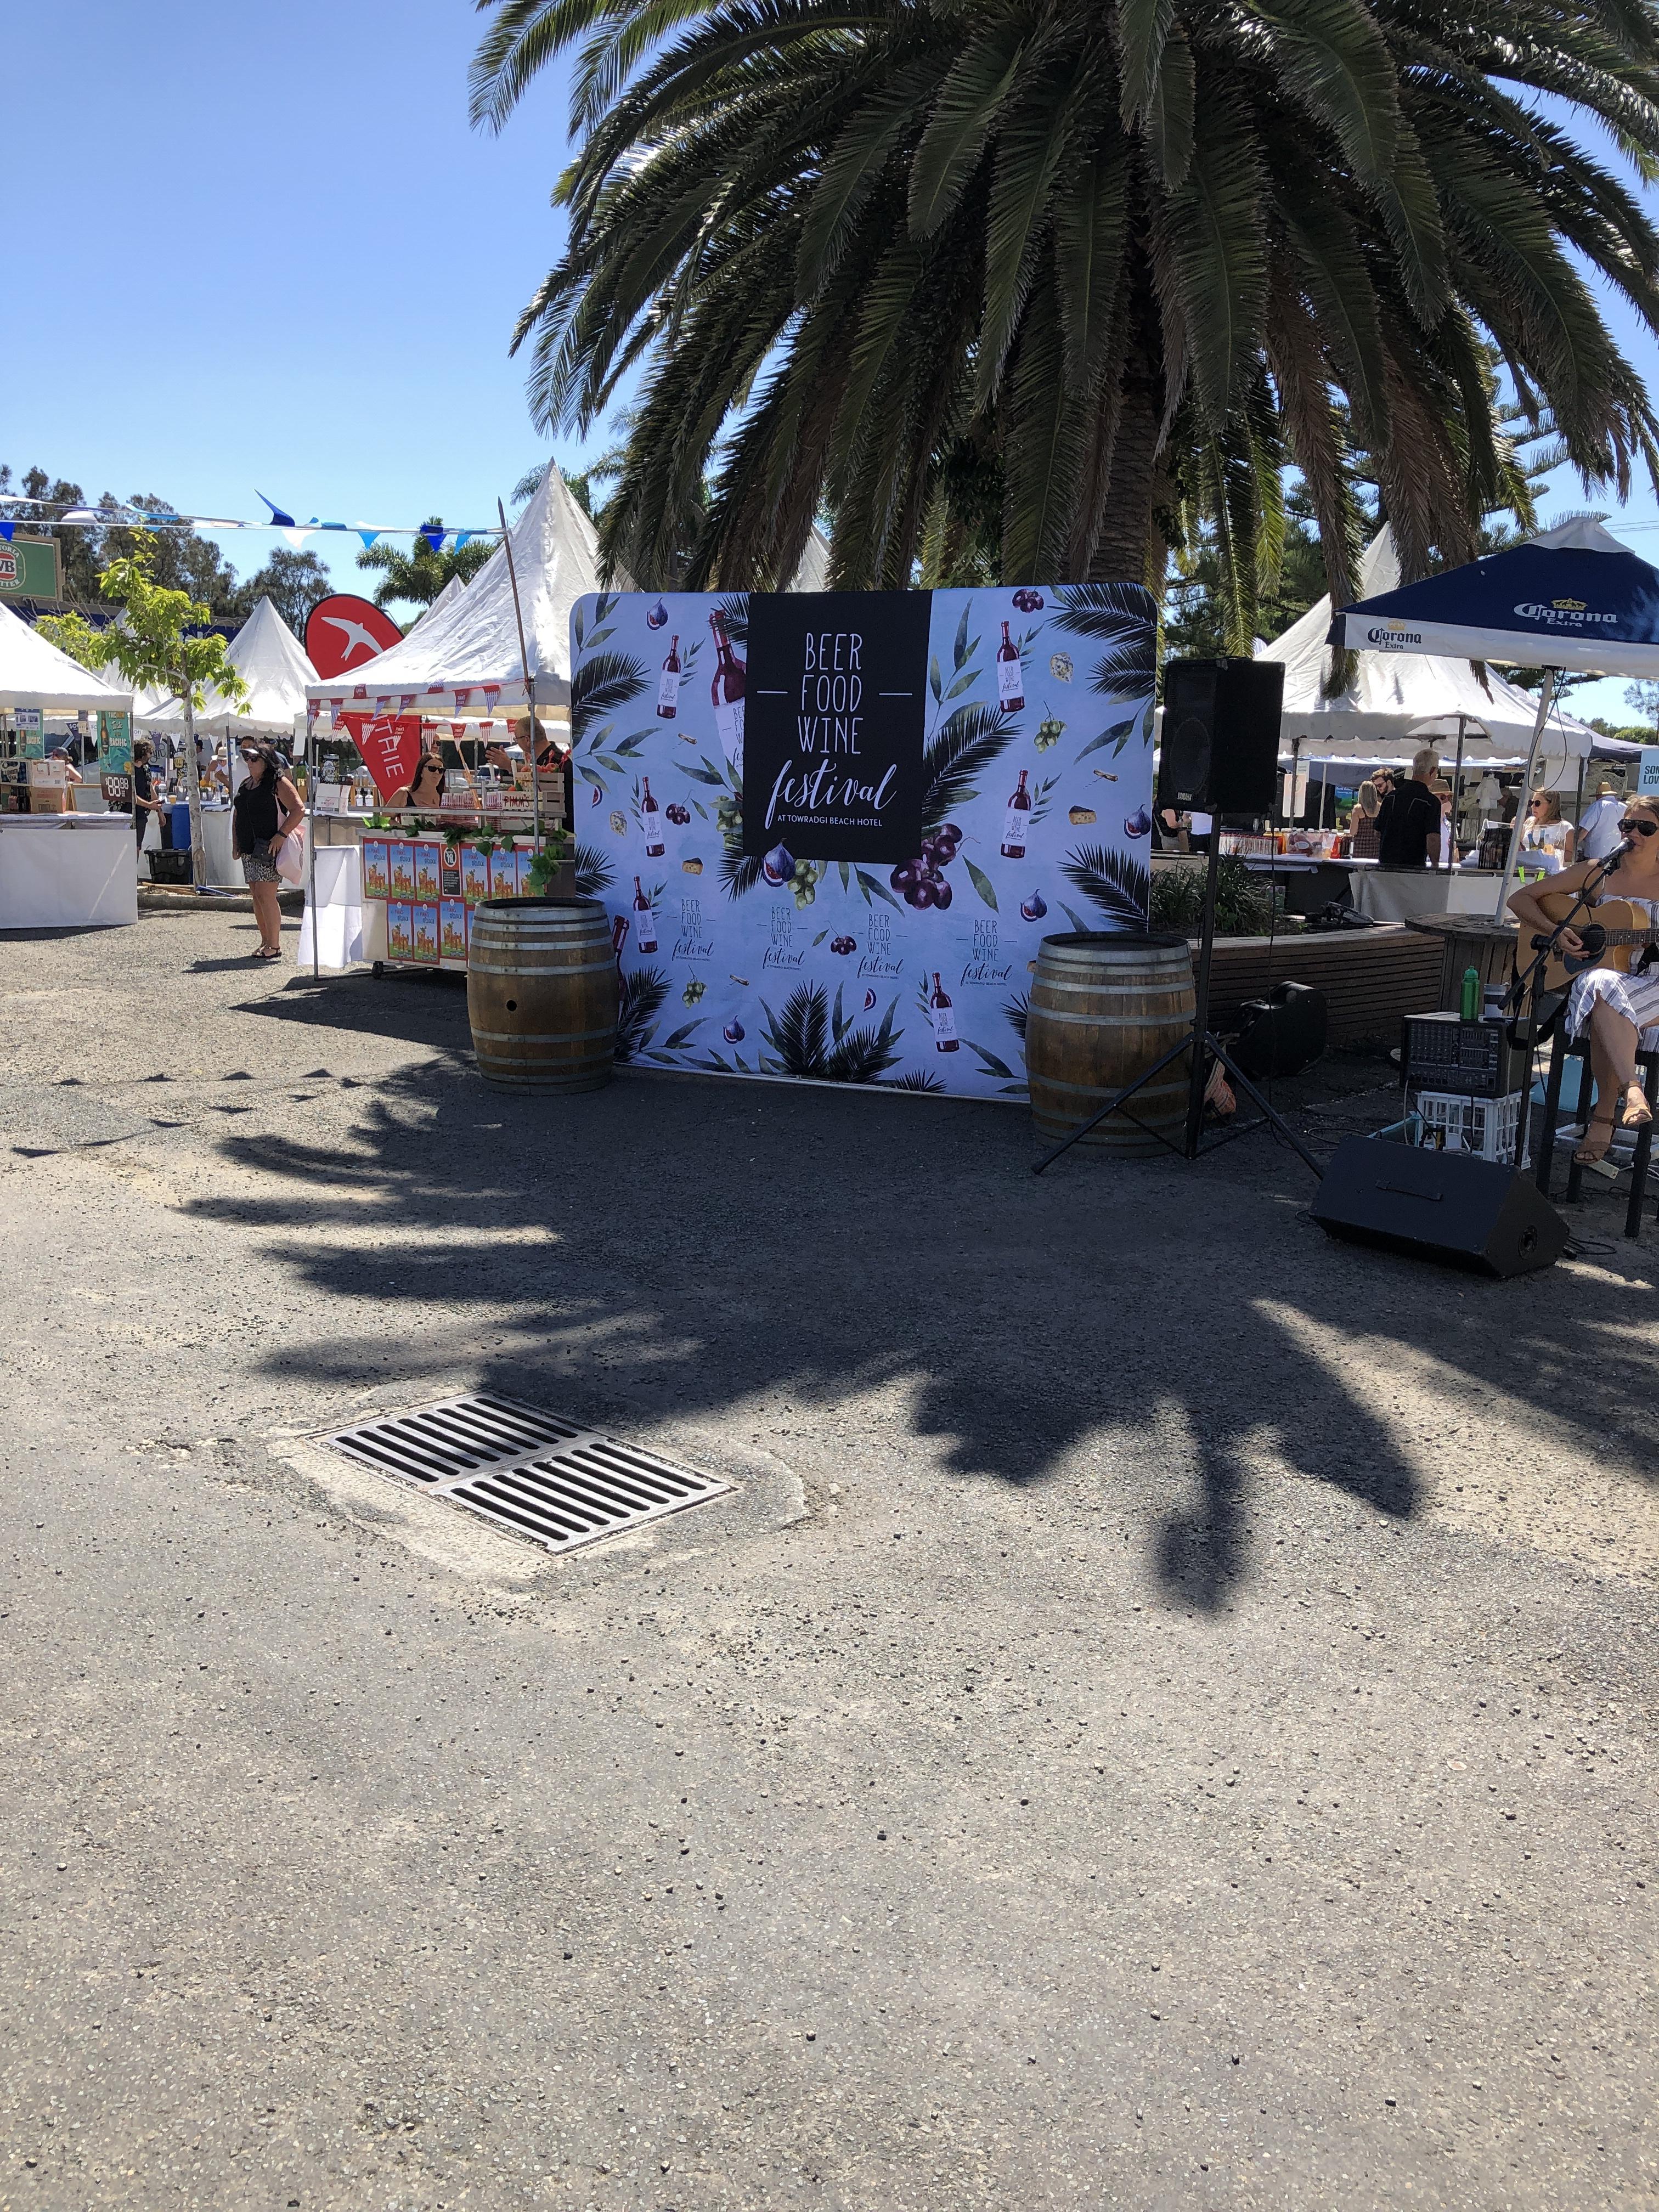 Towradgi Beach Hotel Beer Food and Wine Fair – Advocating